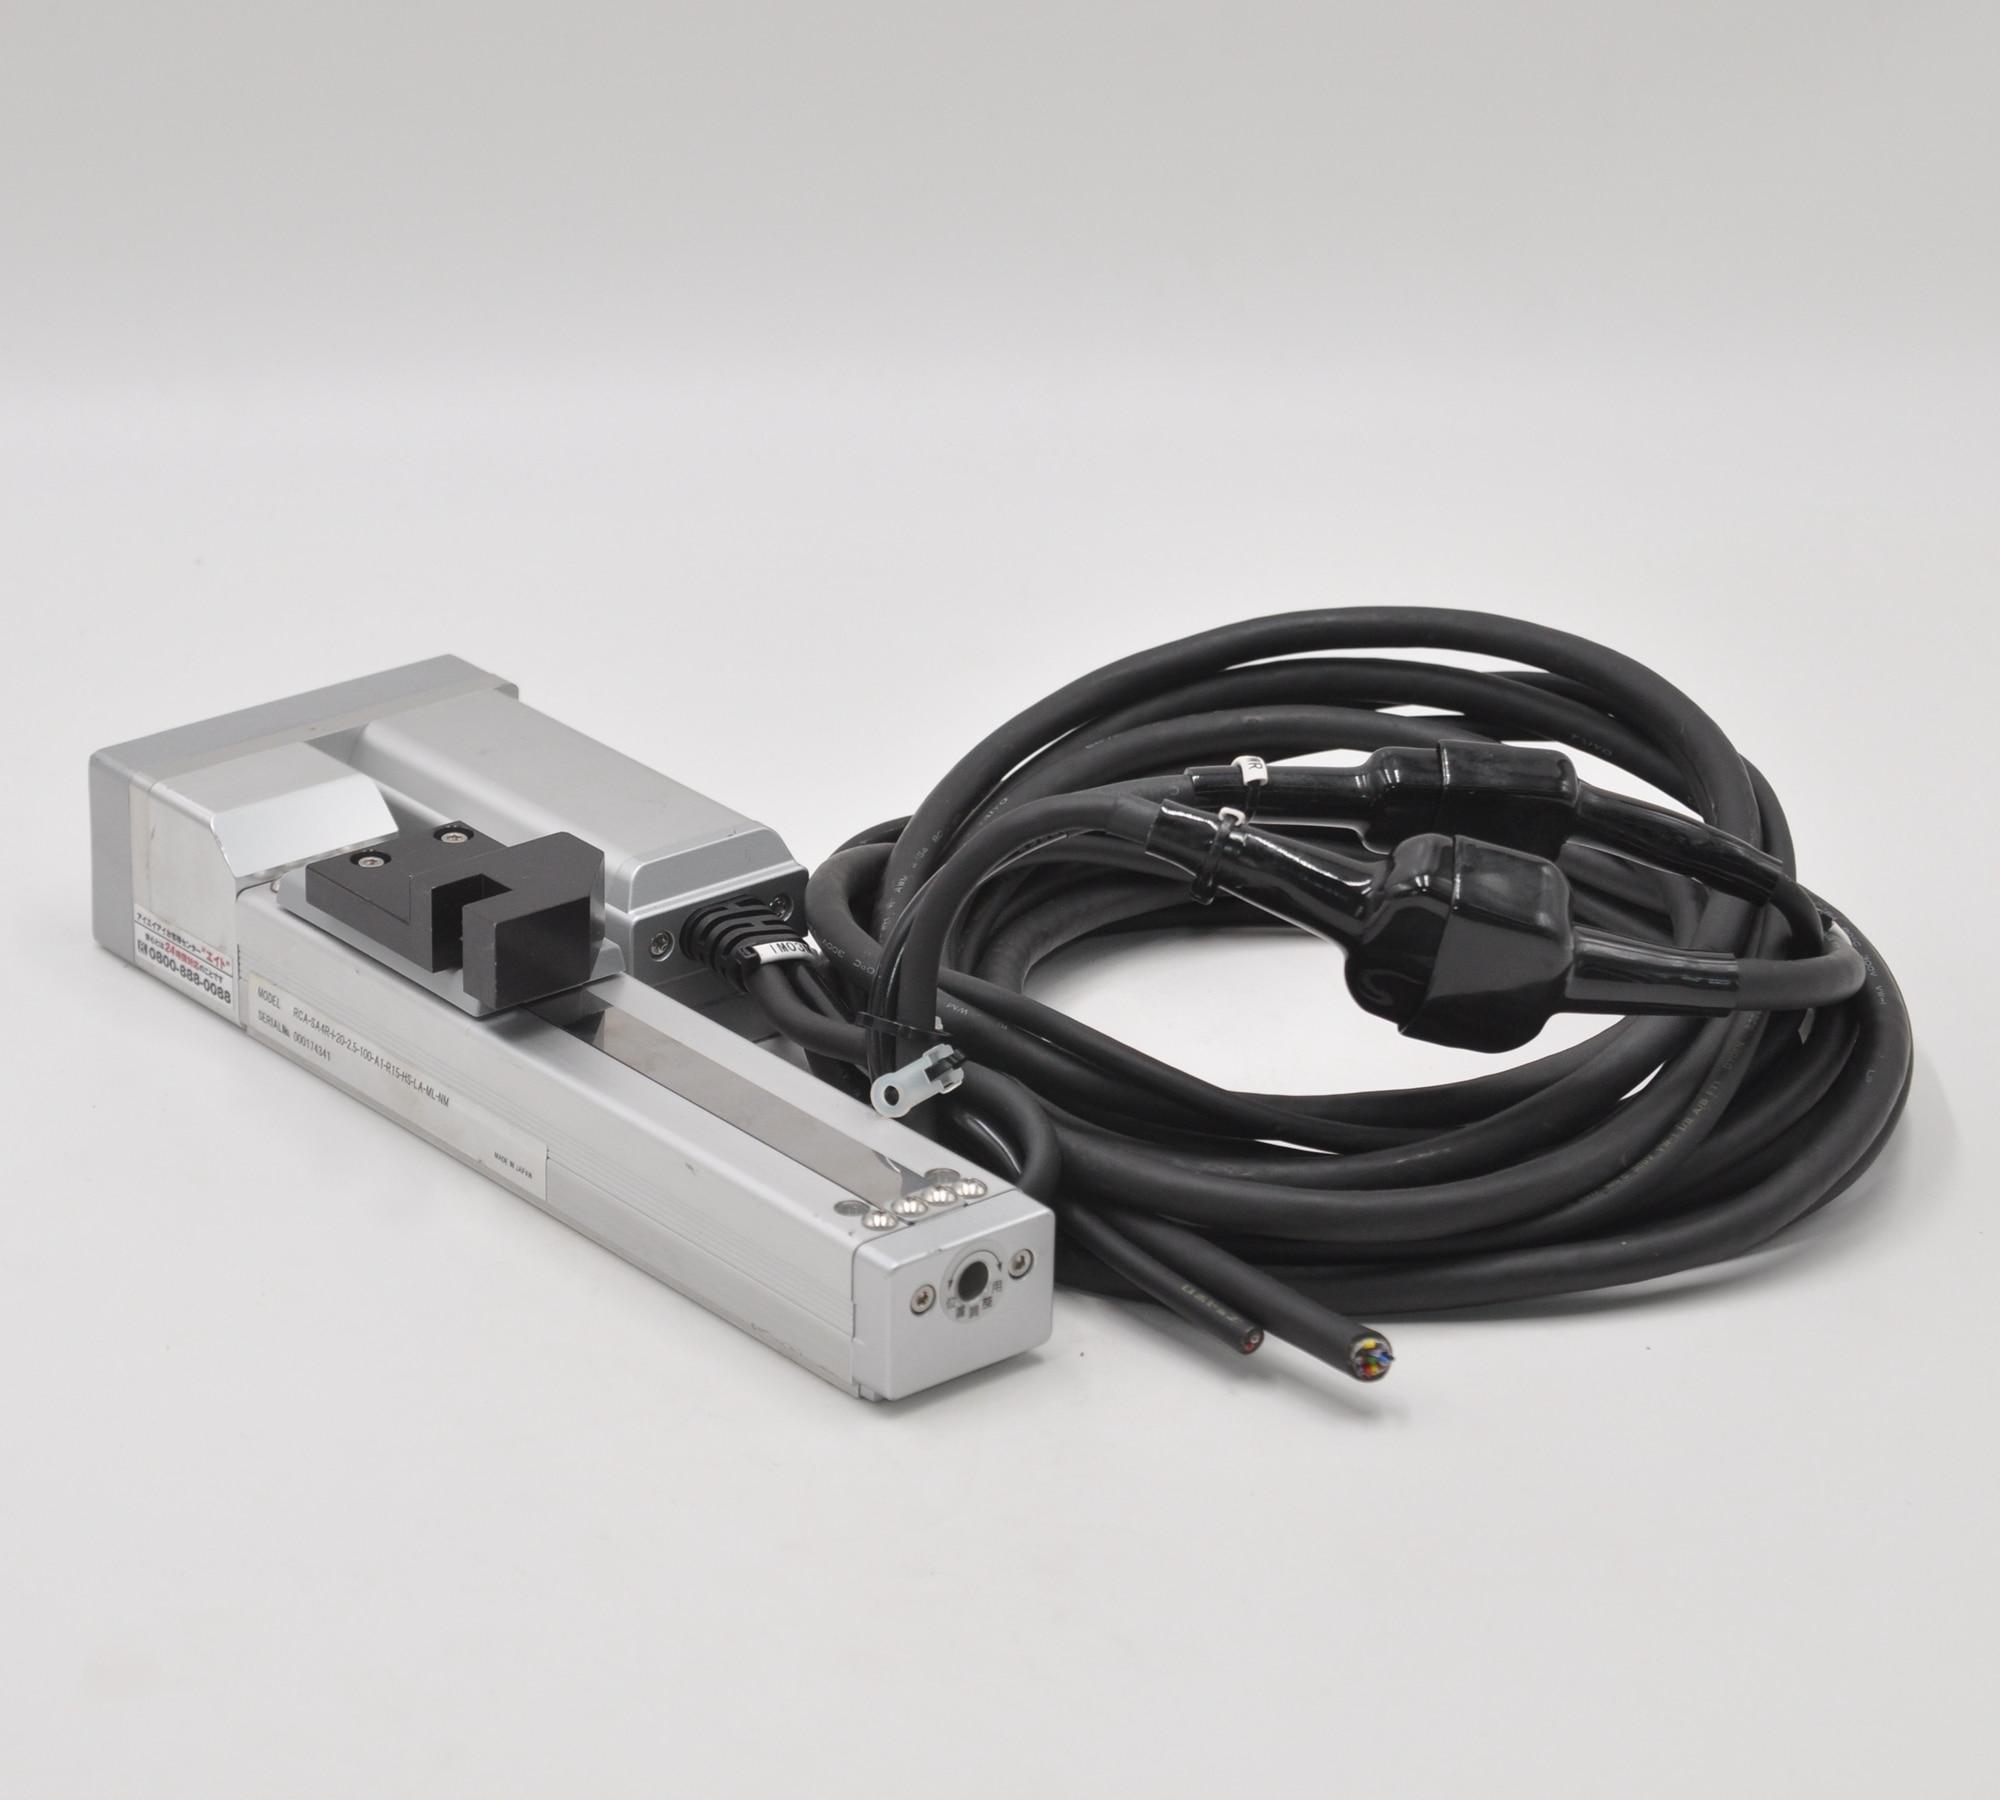 ROBO CYLINDER linear slide RCA-SA4R + 20-2.5-50-A1-R15-HS-LA-MR